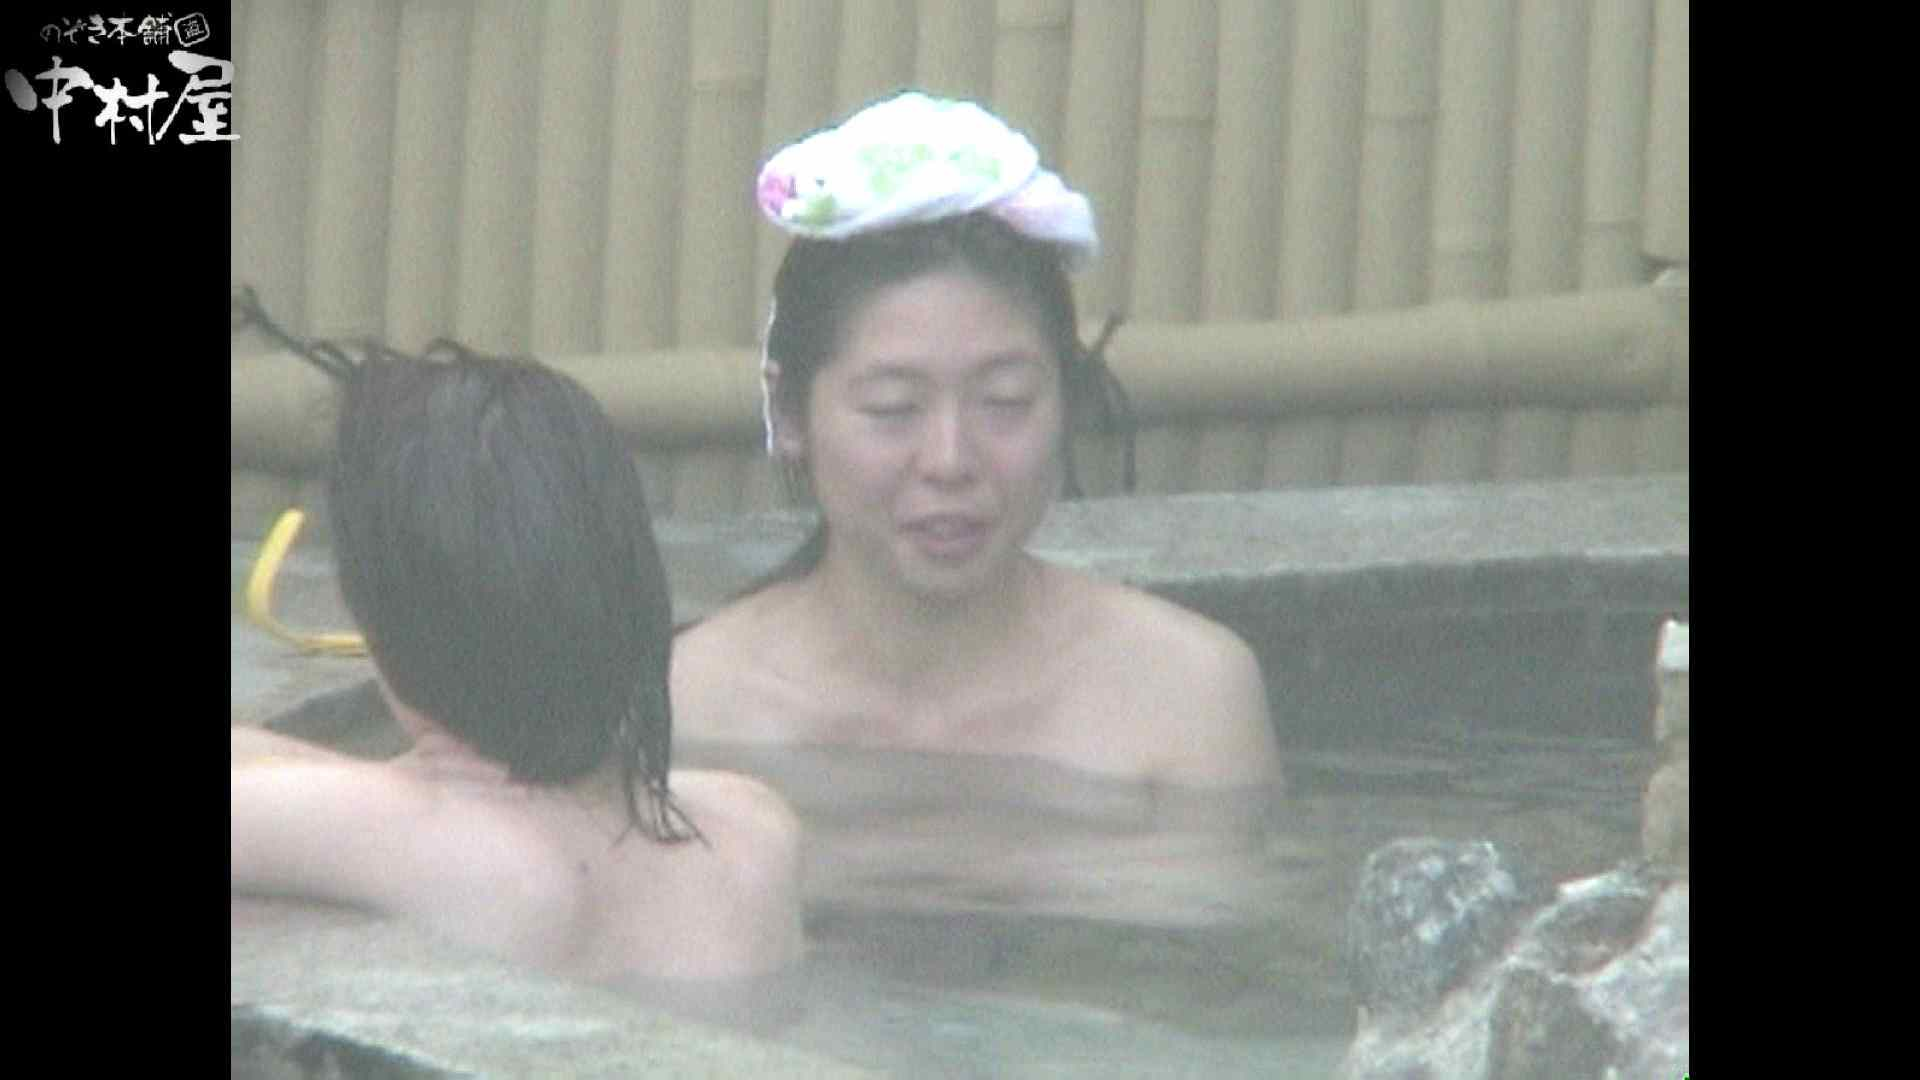 Aquaな露天風呂Vol.932 盗撮師作品   露天風呂突入  106pic 61